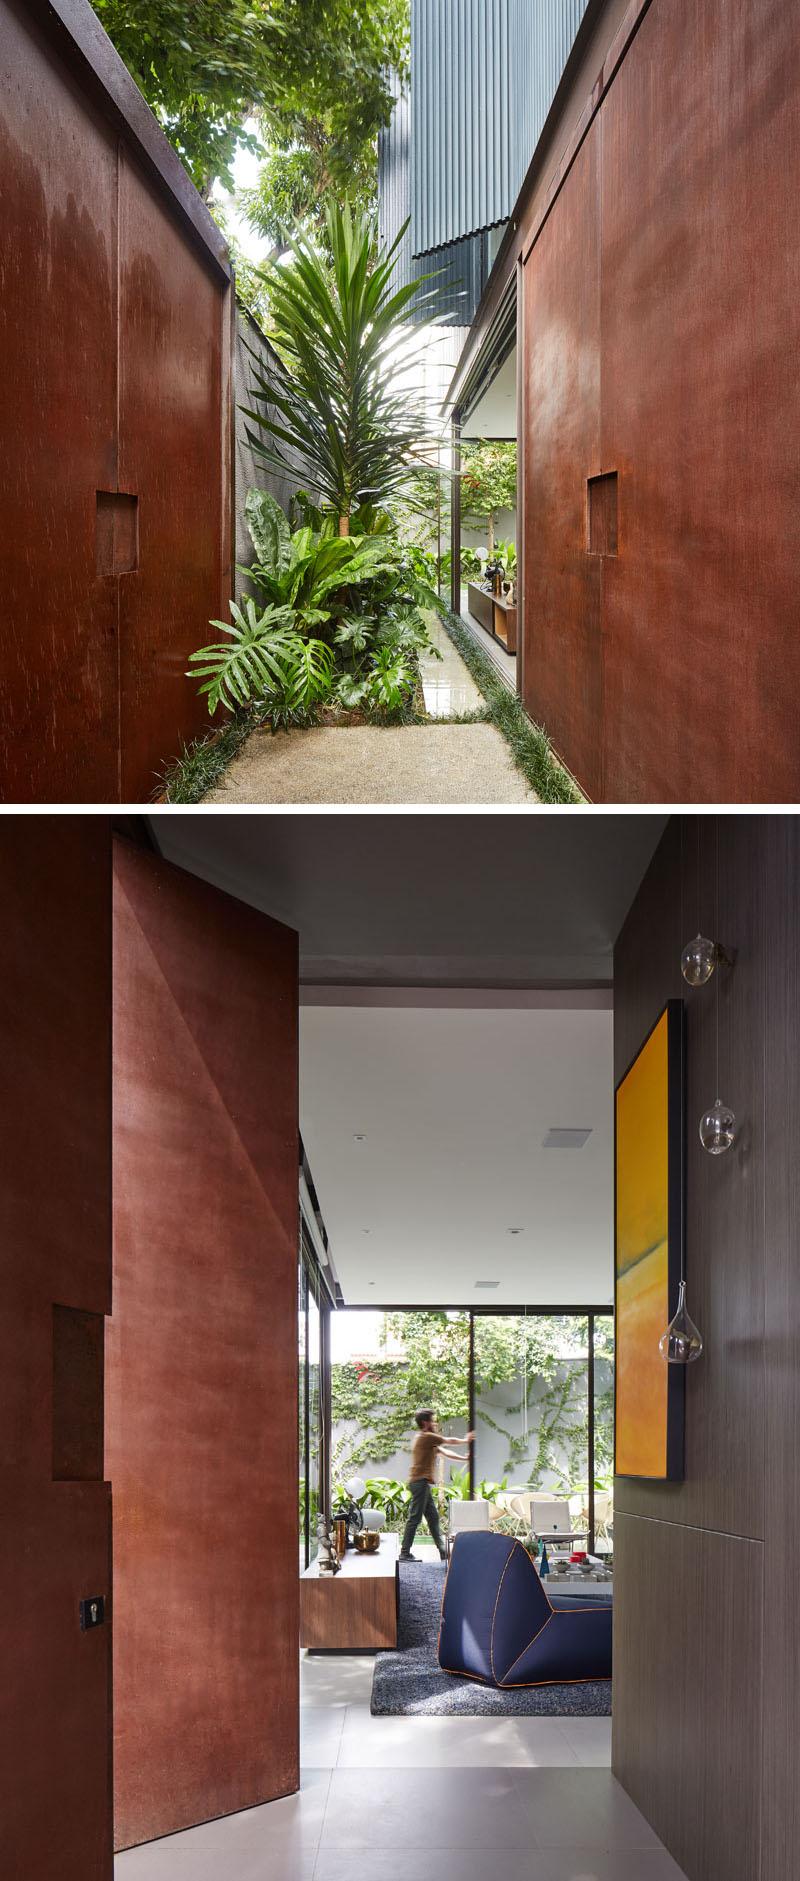 Box House in São Paulo, Brazil by FCStudio